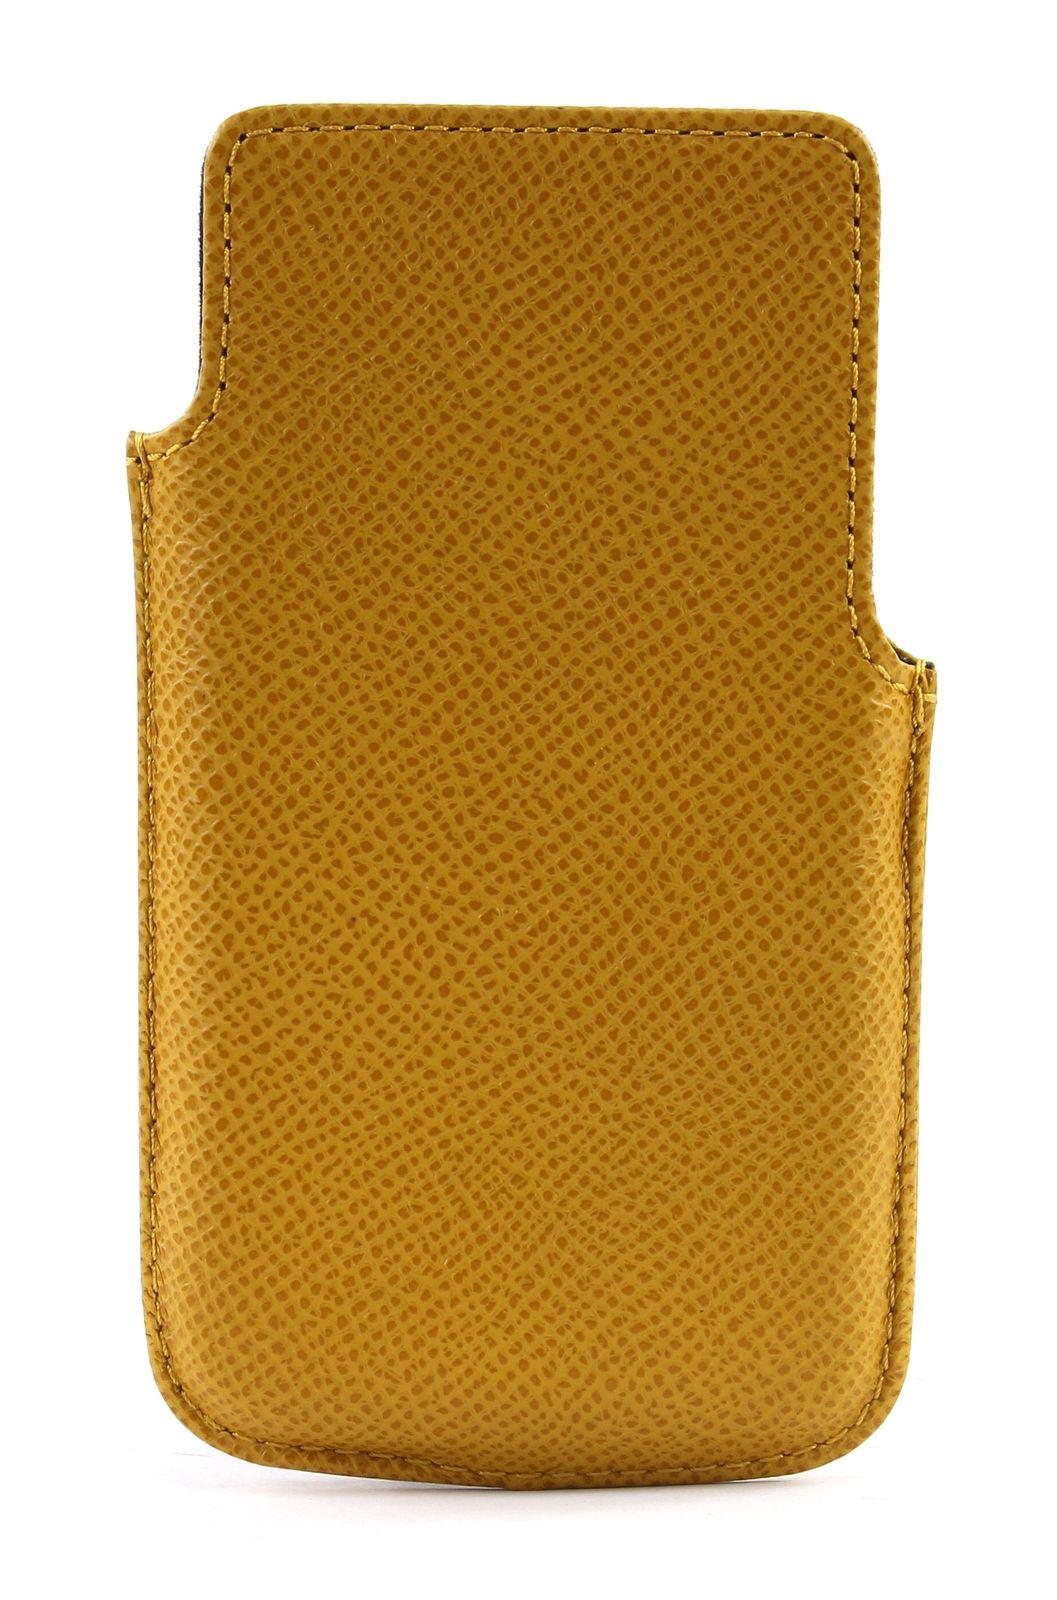 PORSCHE DESIGN French Classic iPhone 4 Case Mustard